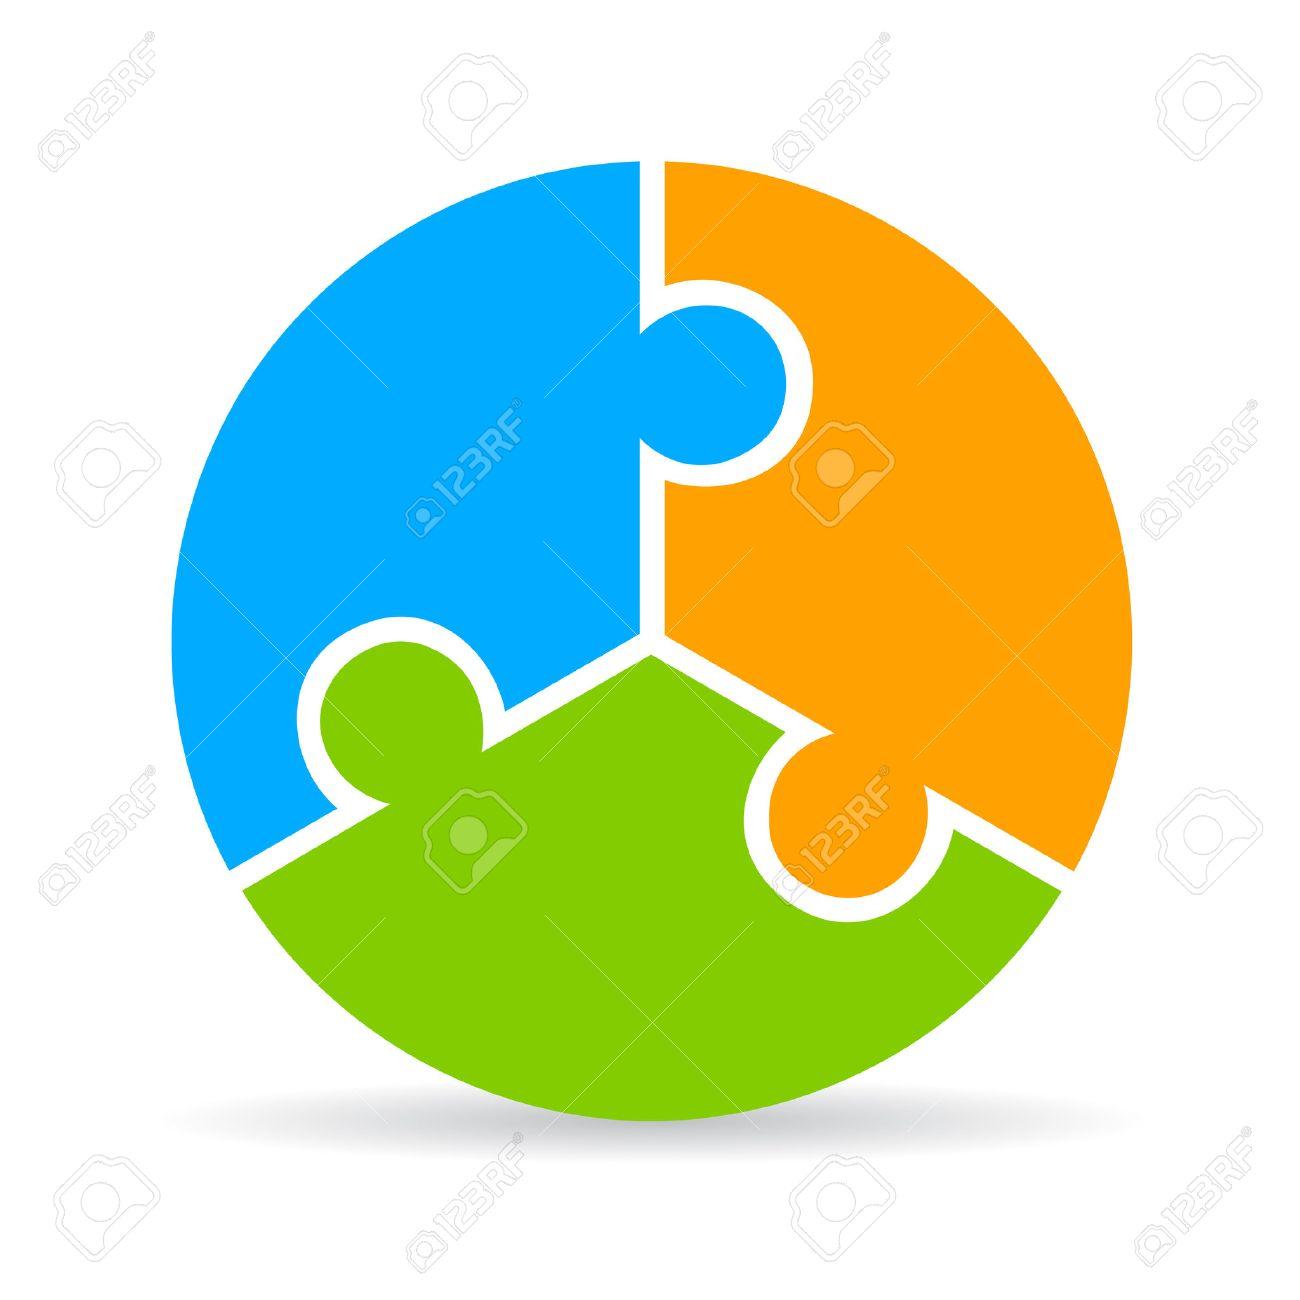 Three part puzzle process diagram royalty free cliparts vetores e imagens three part puzzle process diagram ccuart Choice Image